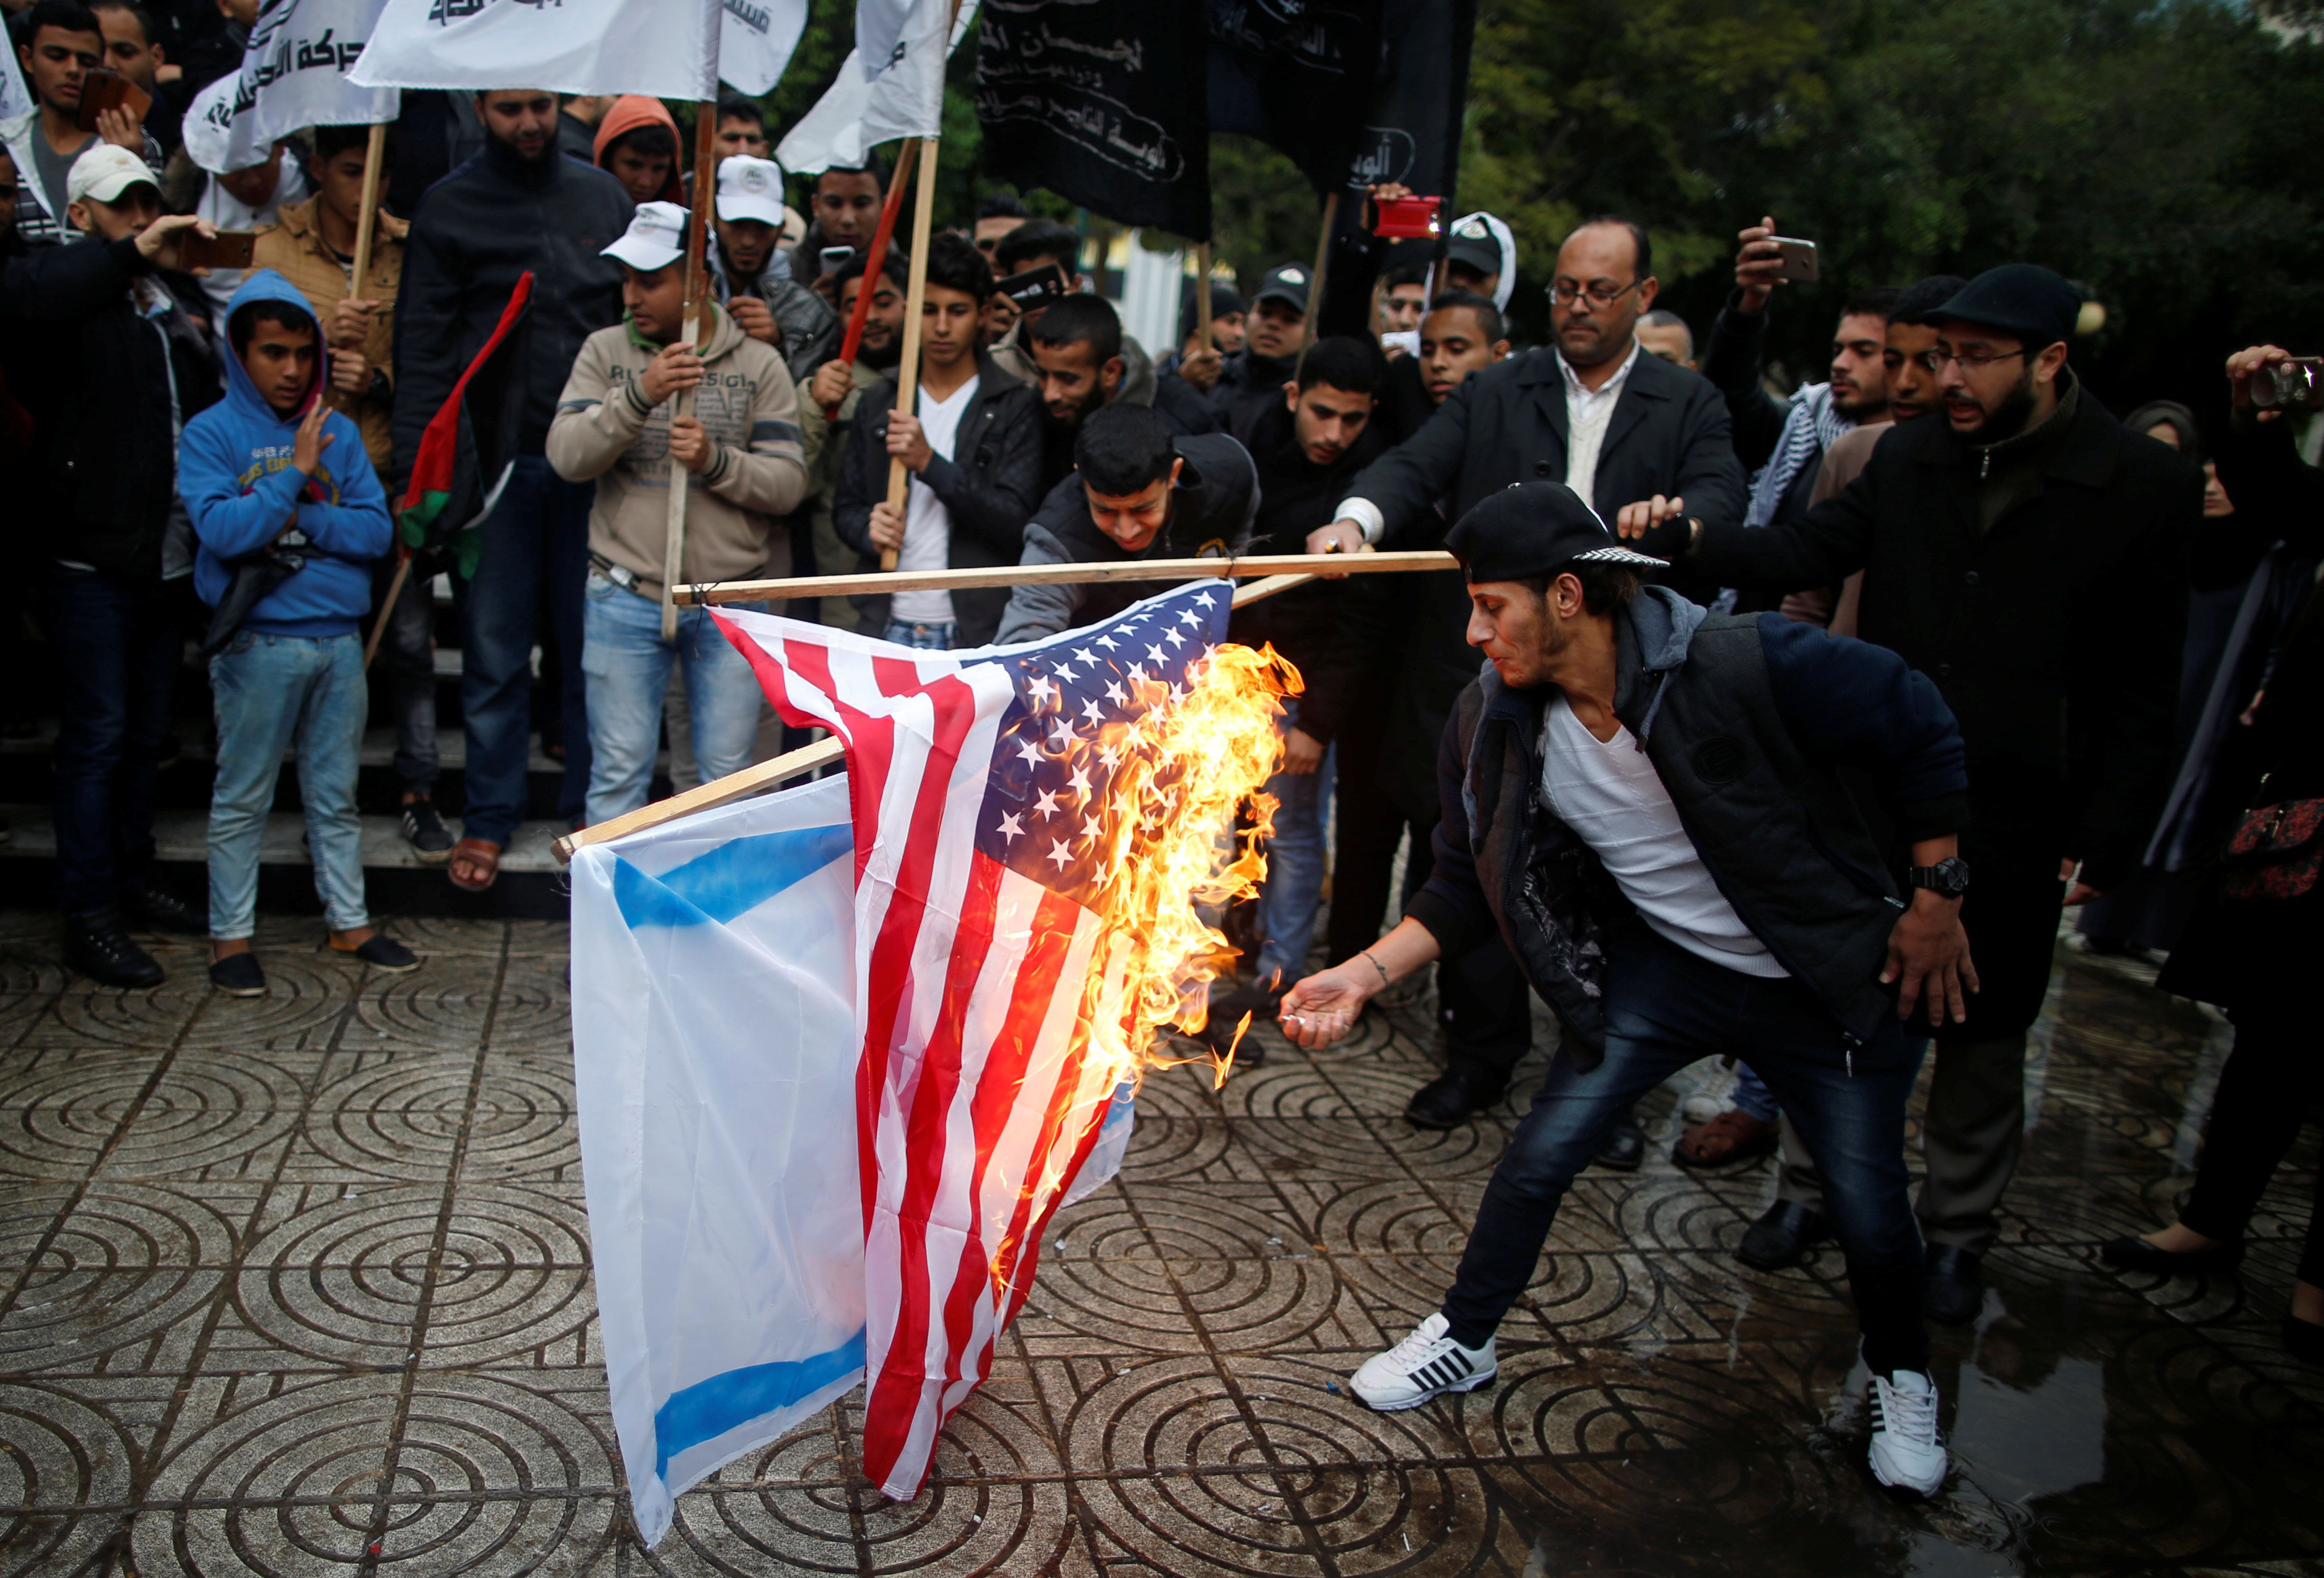 Leaders Around The World Incensed Over Trump's Jerusalem